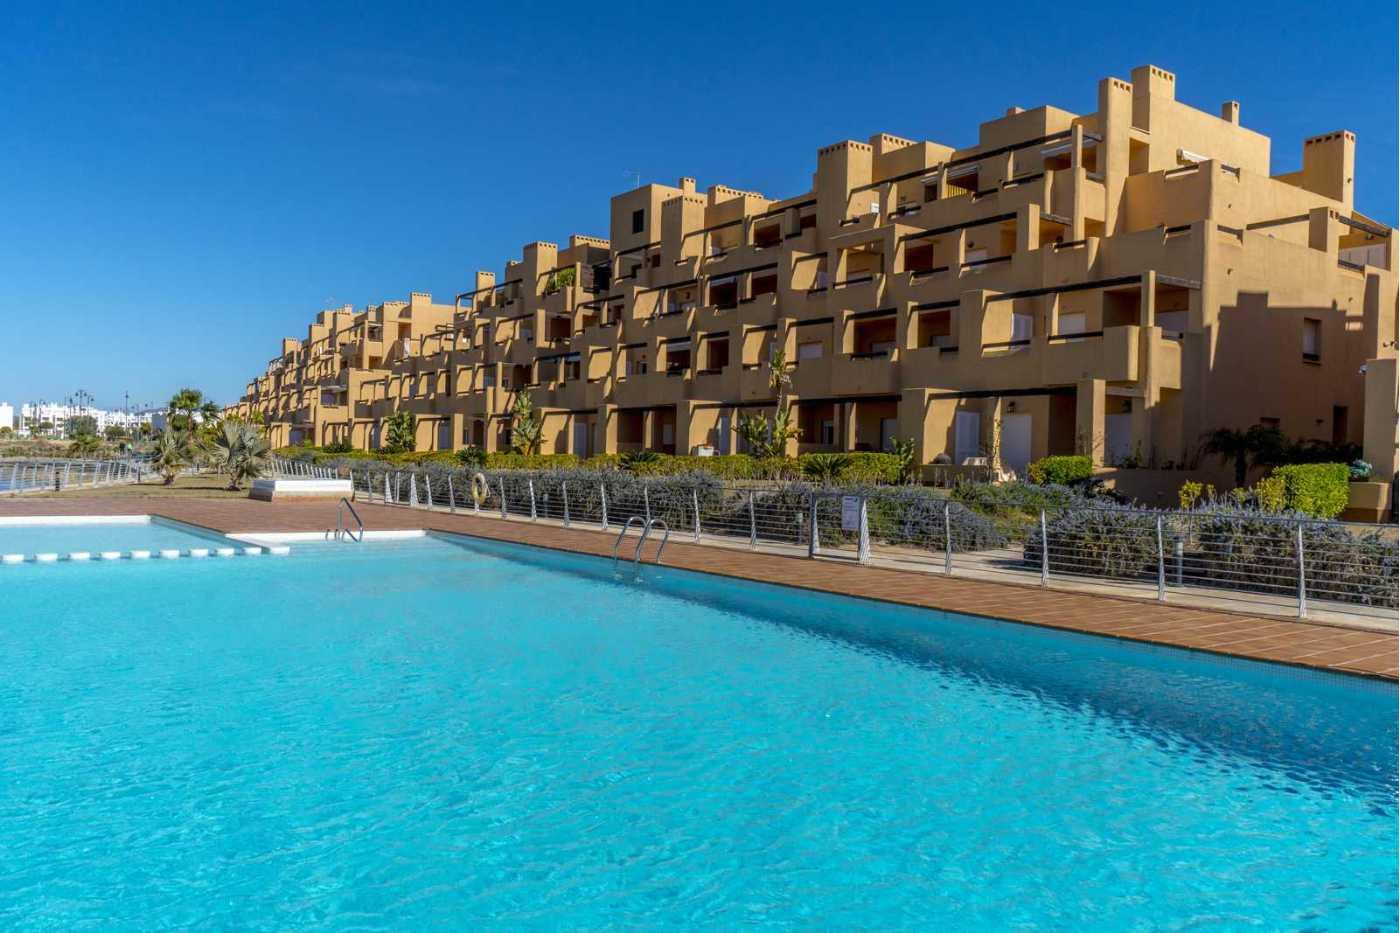 Apartment In Sell In C Tour De Francia Las Terrazas De La Torre Ii Golf Resort Torre Pacheco Murcia Pm54859 M69667